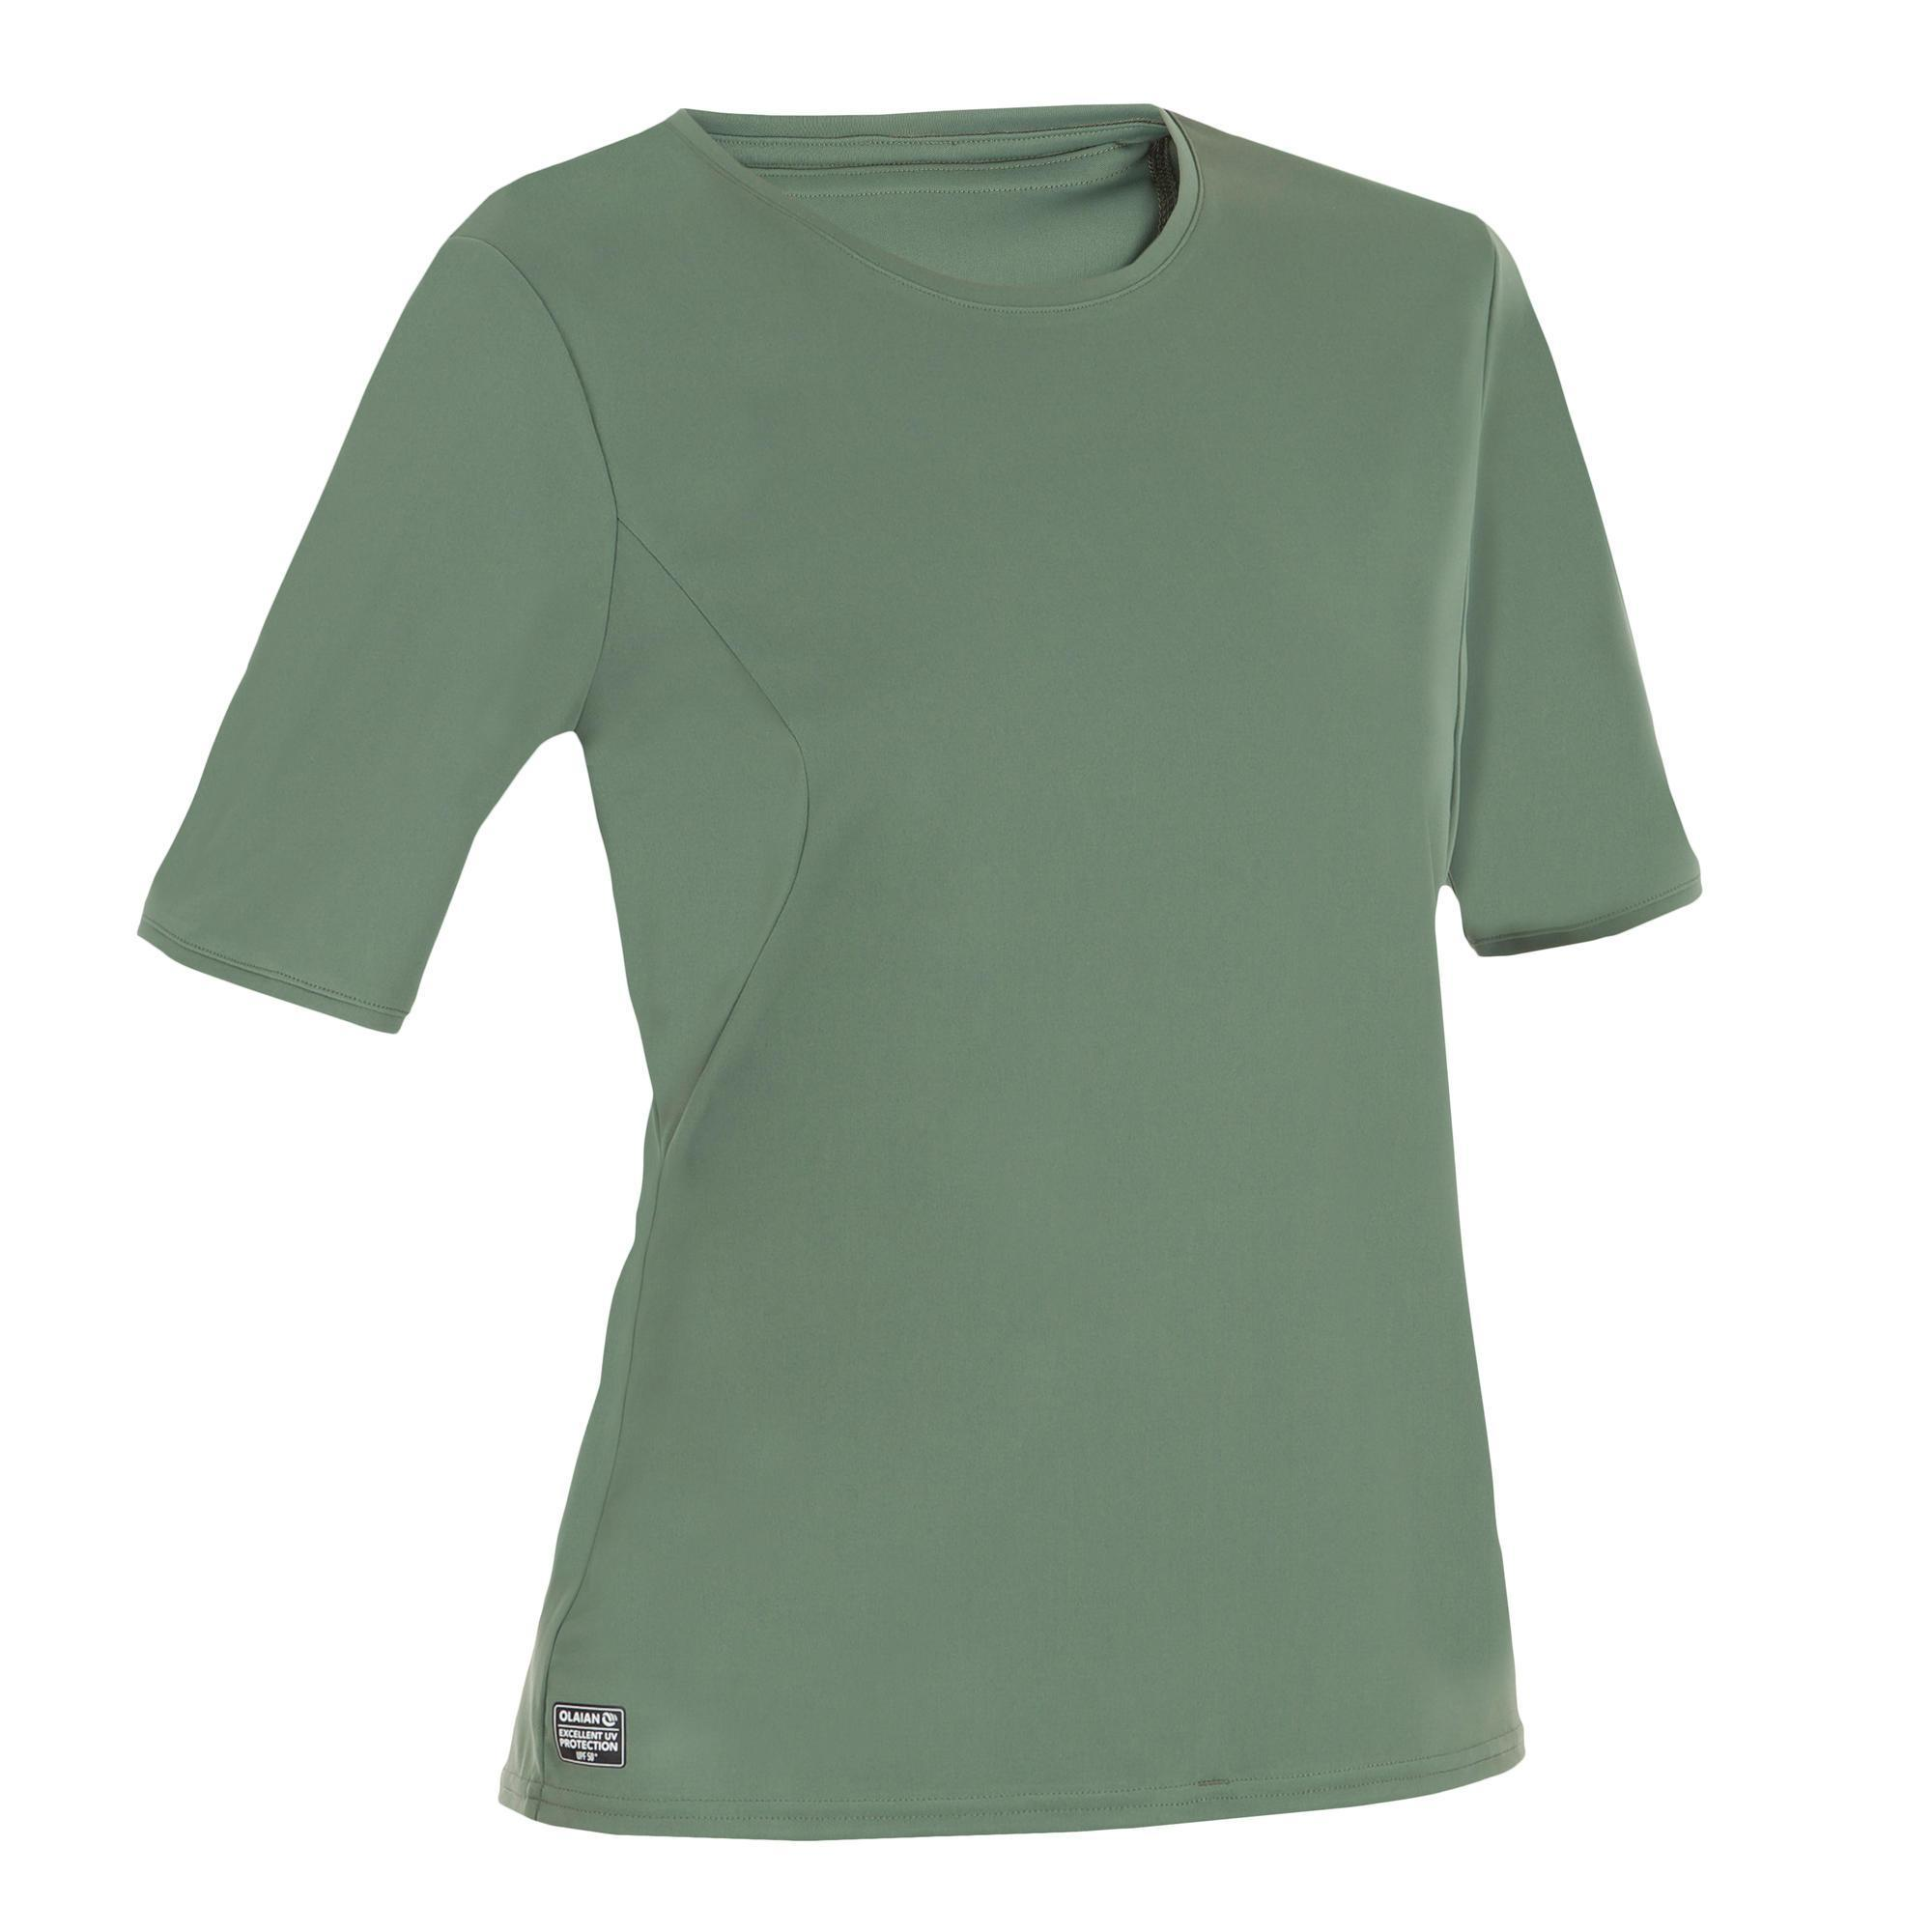 UV-Shirt kurzarm Surfen Damen grau/grün